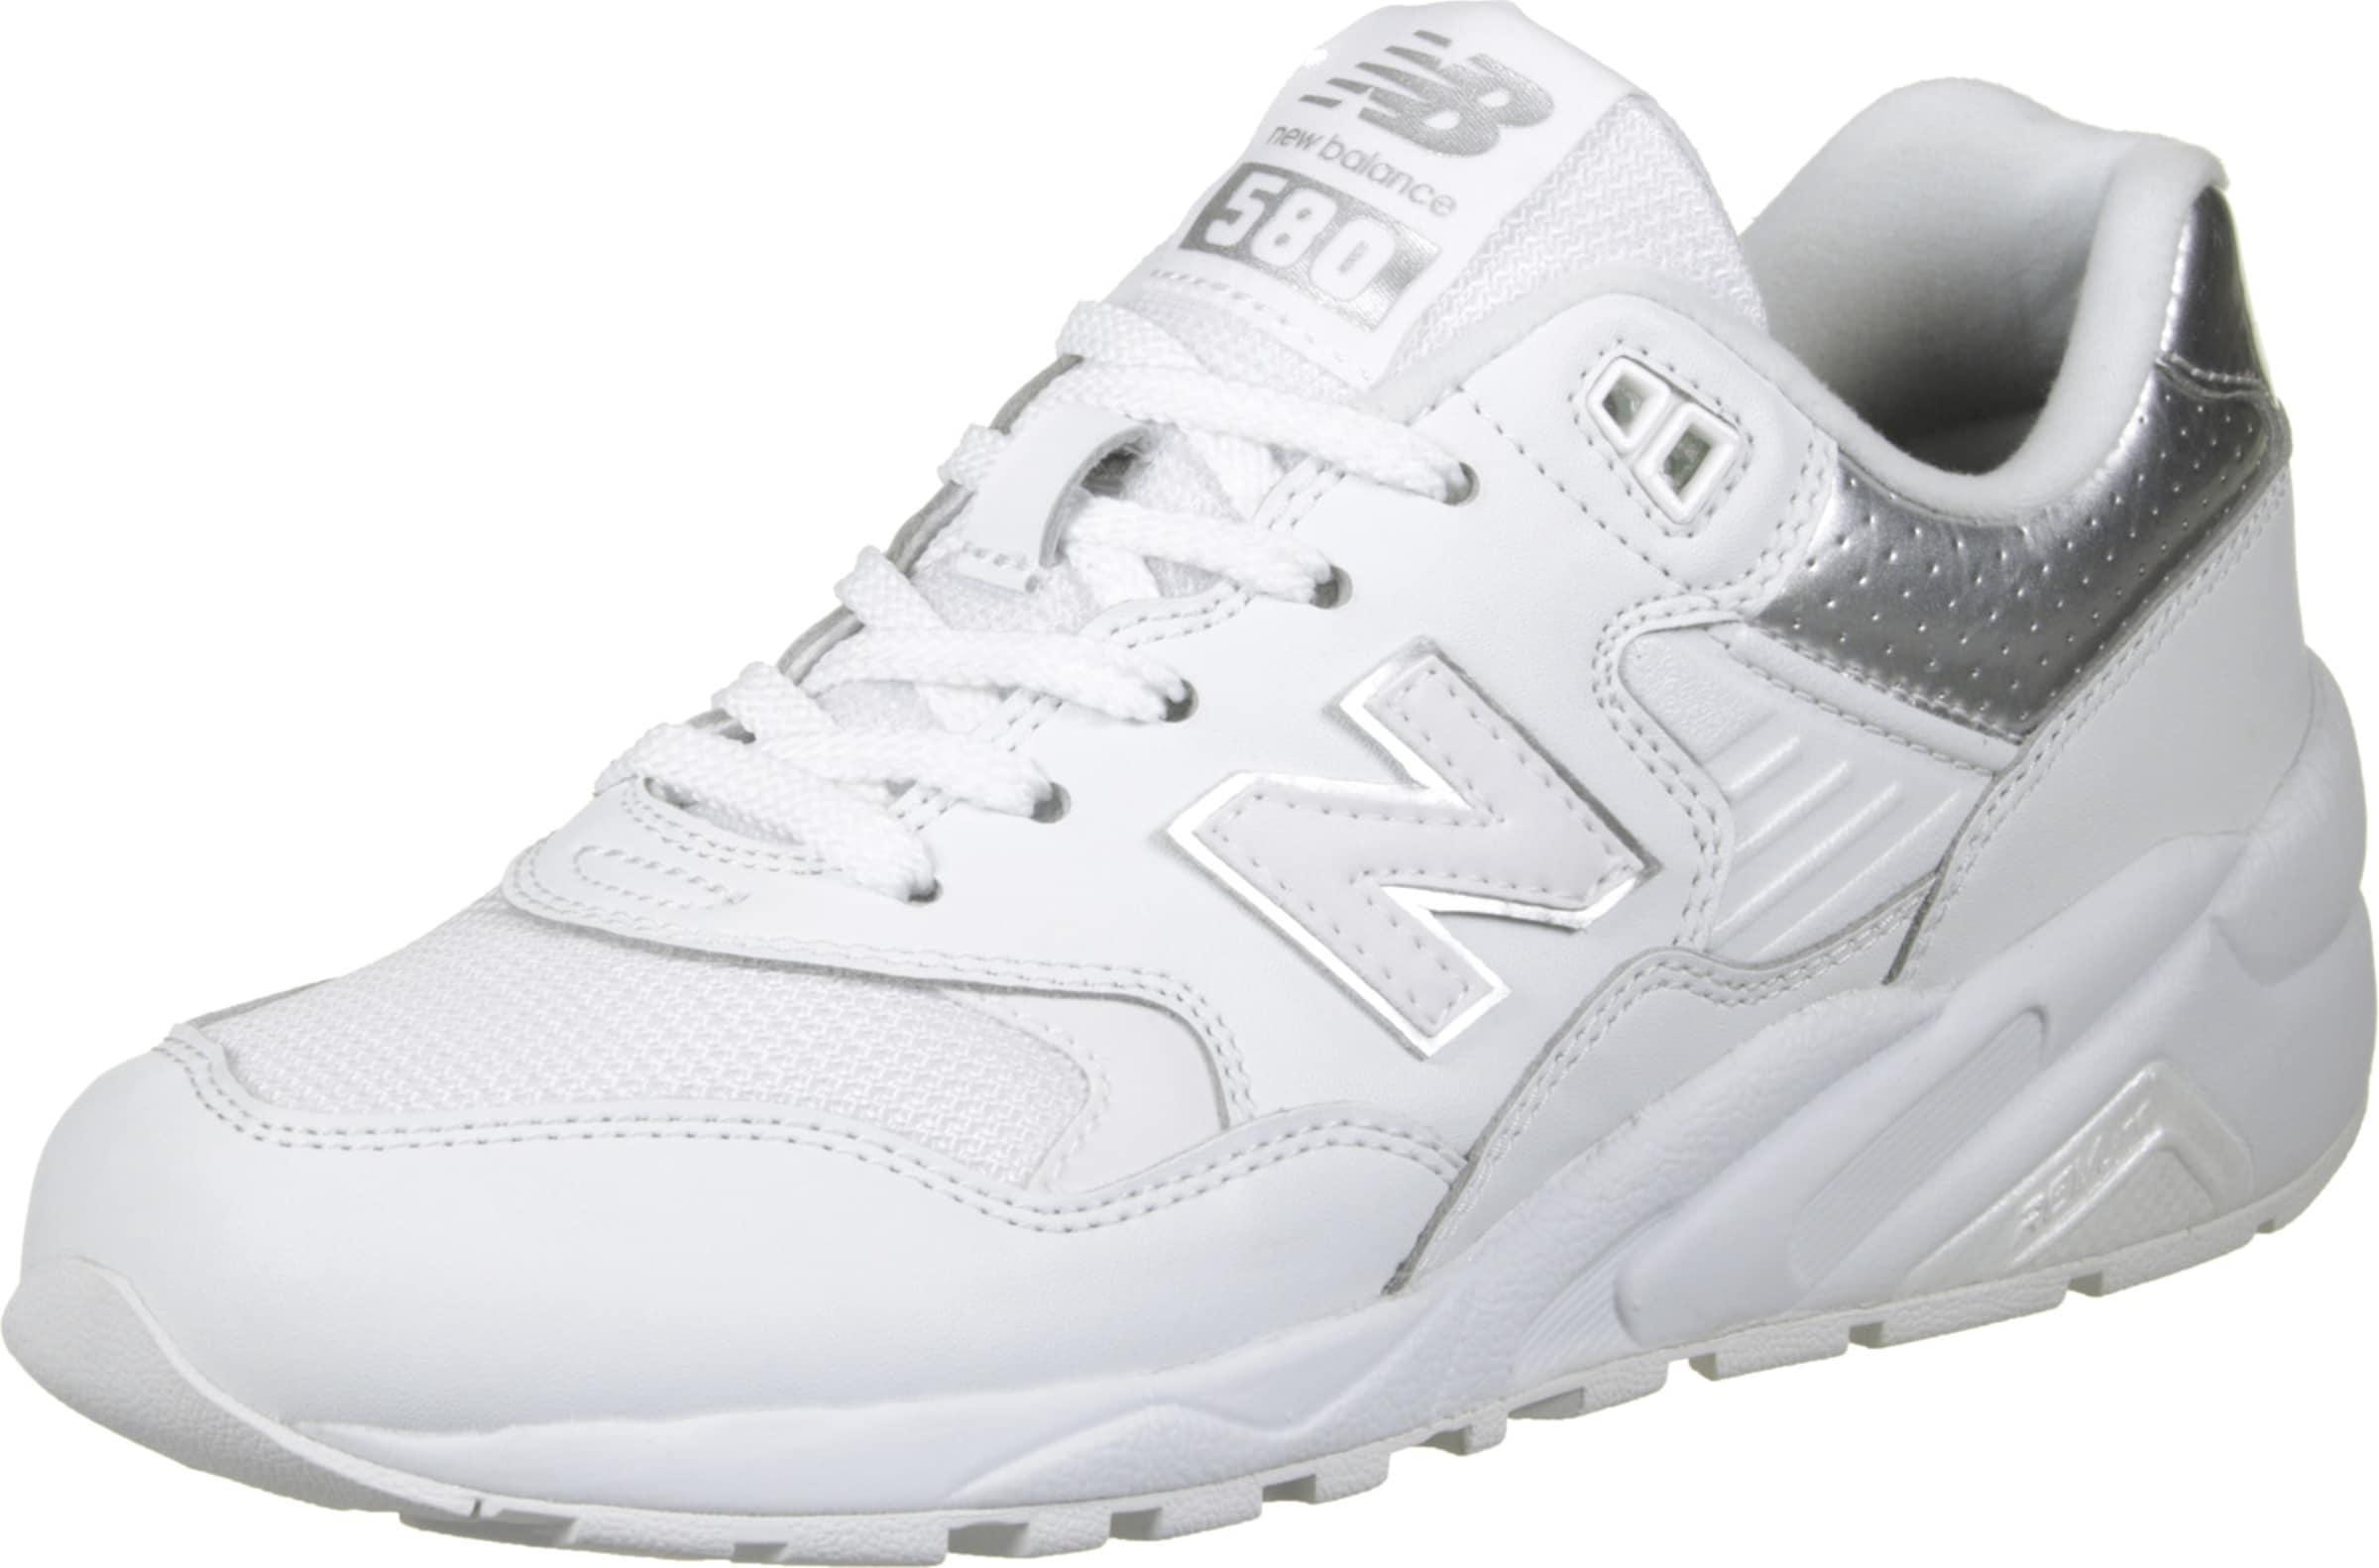 SilberWeiß Balance 'wrt580' New Sneaker In ulFcTK31J